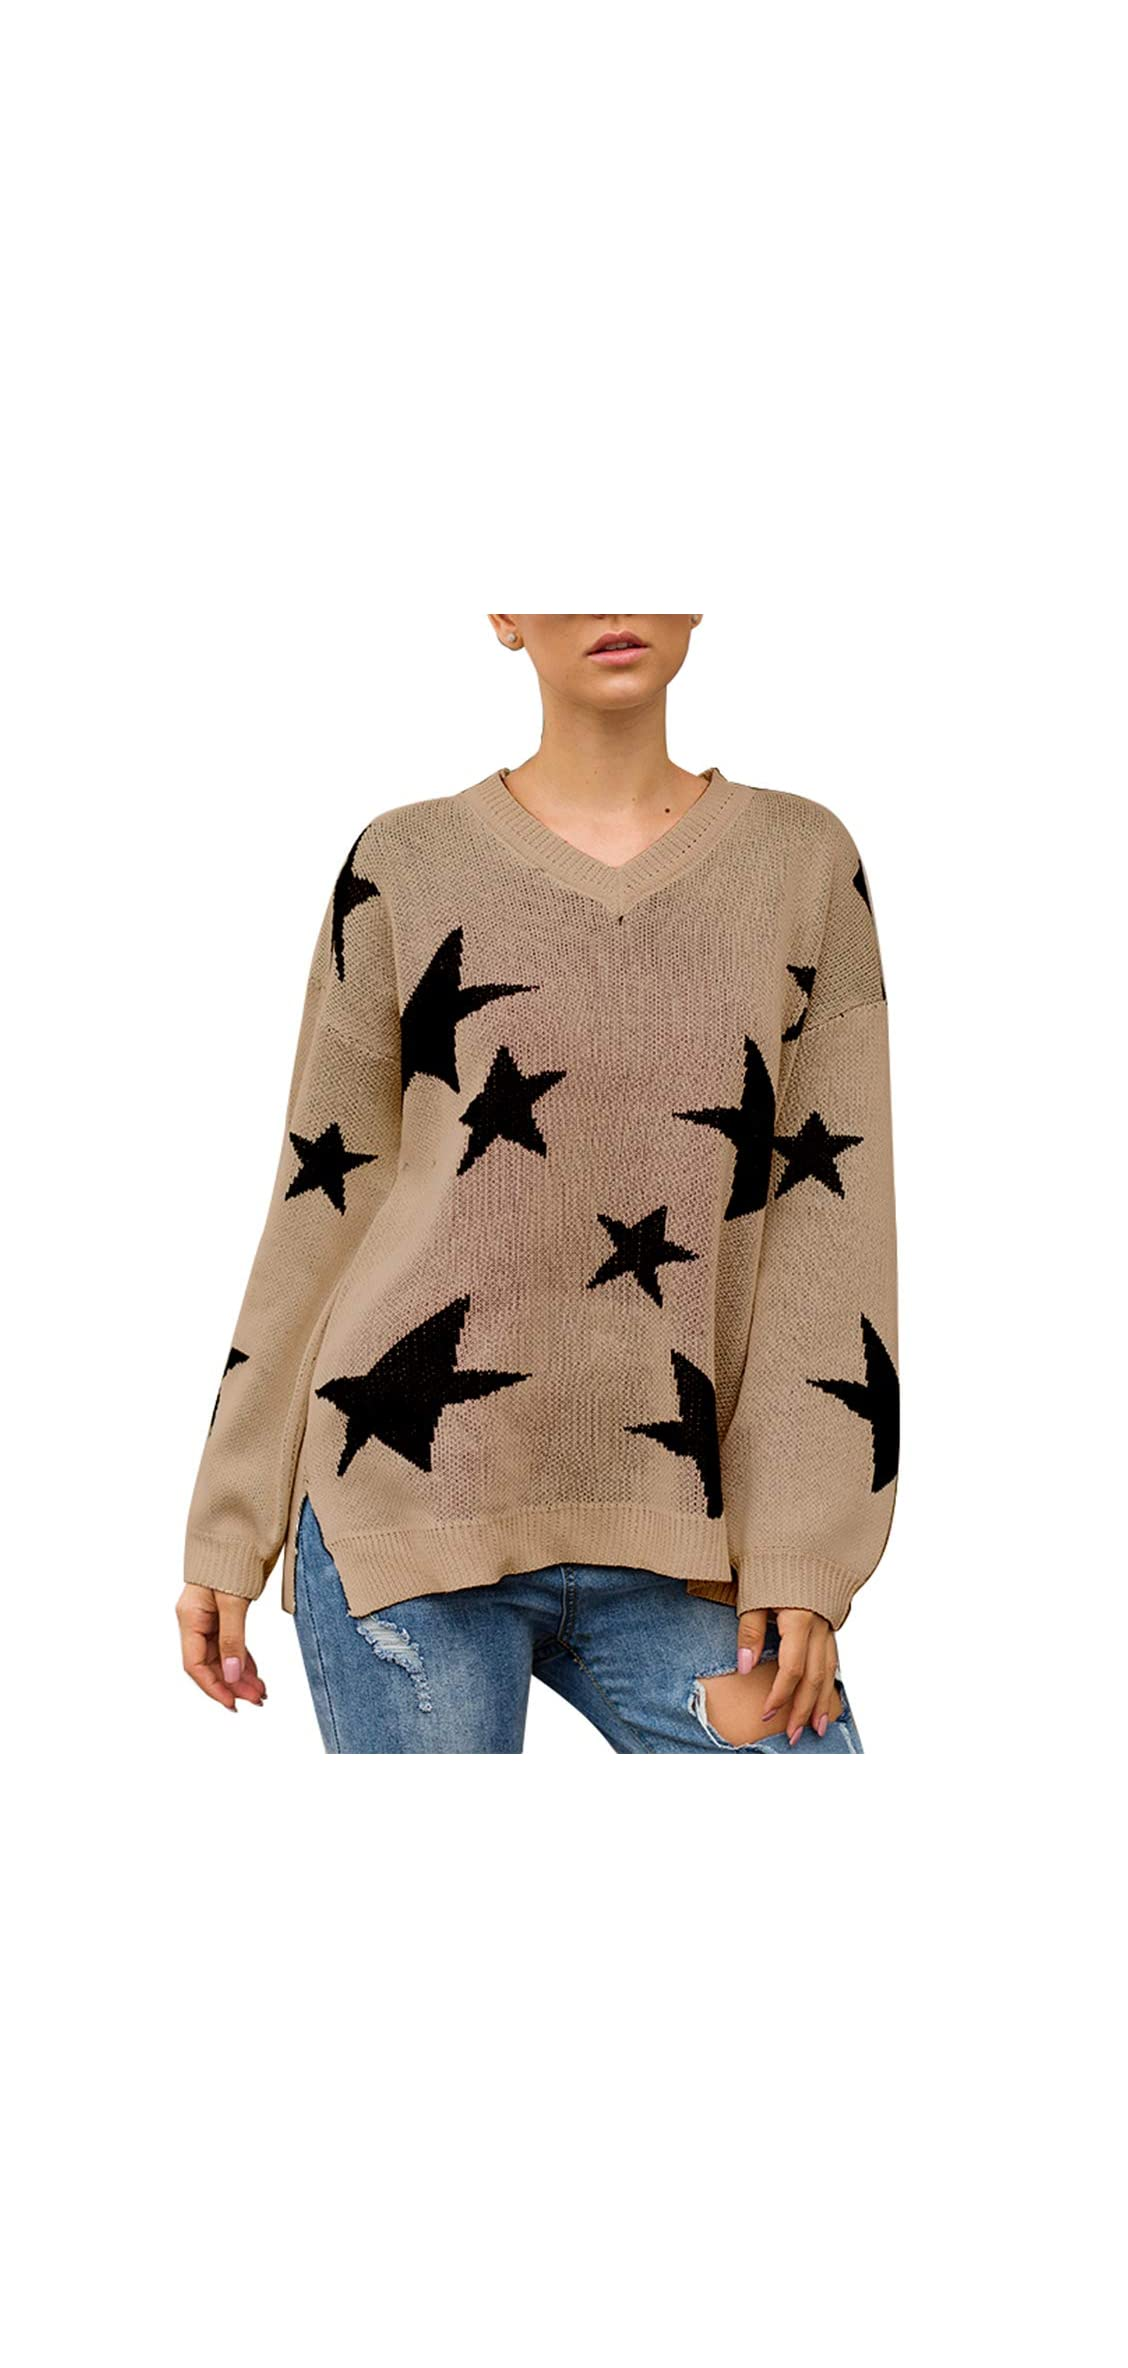 Womens Winter V Neck Lantern Long Sleeve Star Knit